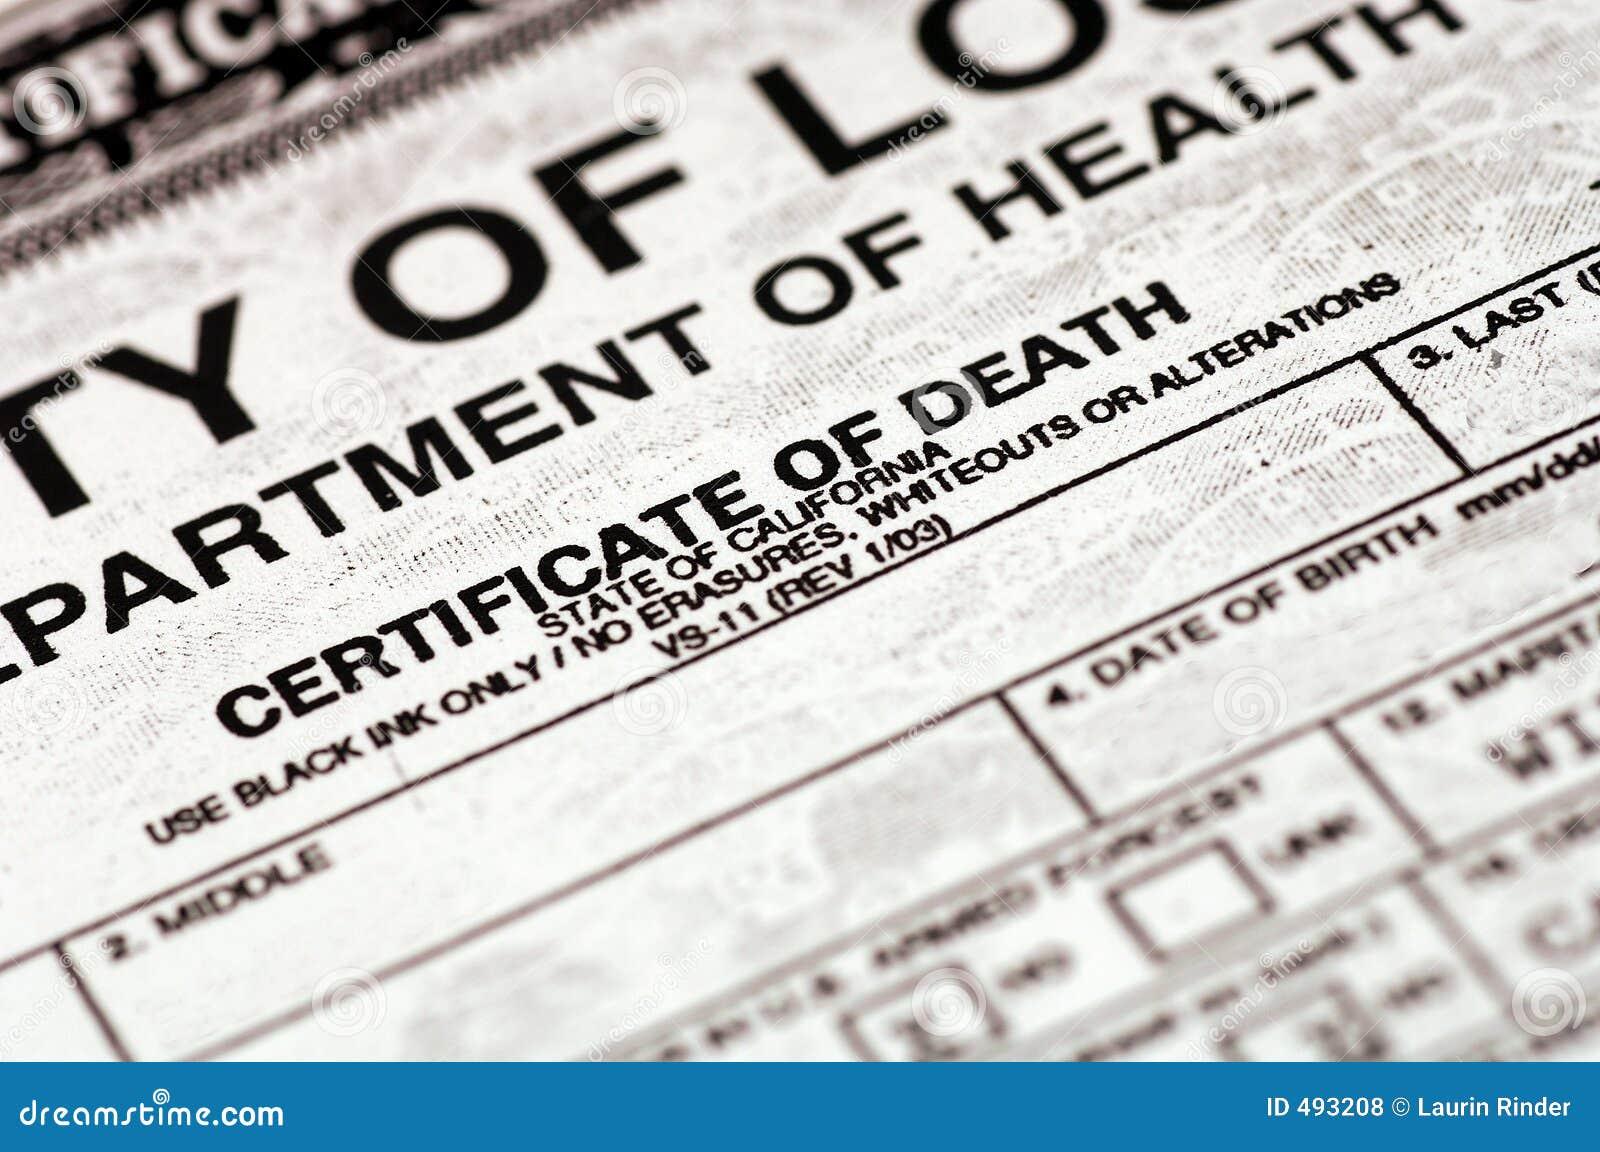 Free clip art death certificate cliparts free clip art death certificate xflitez Images